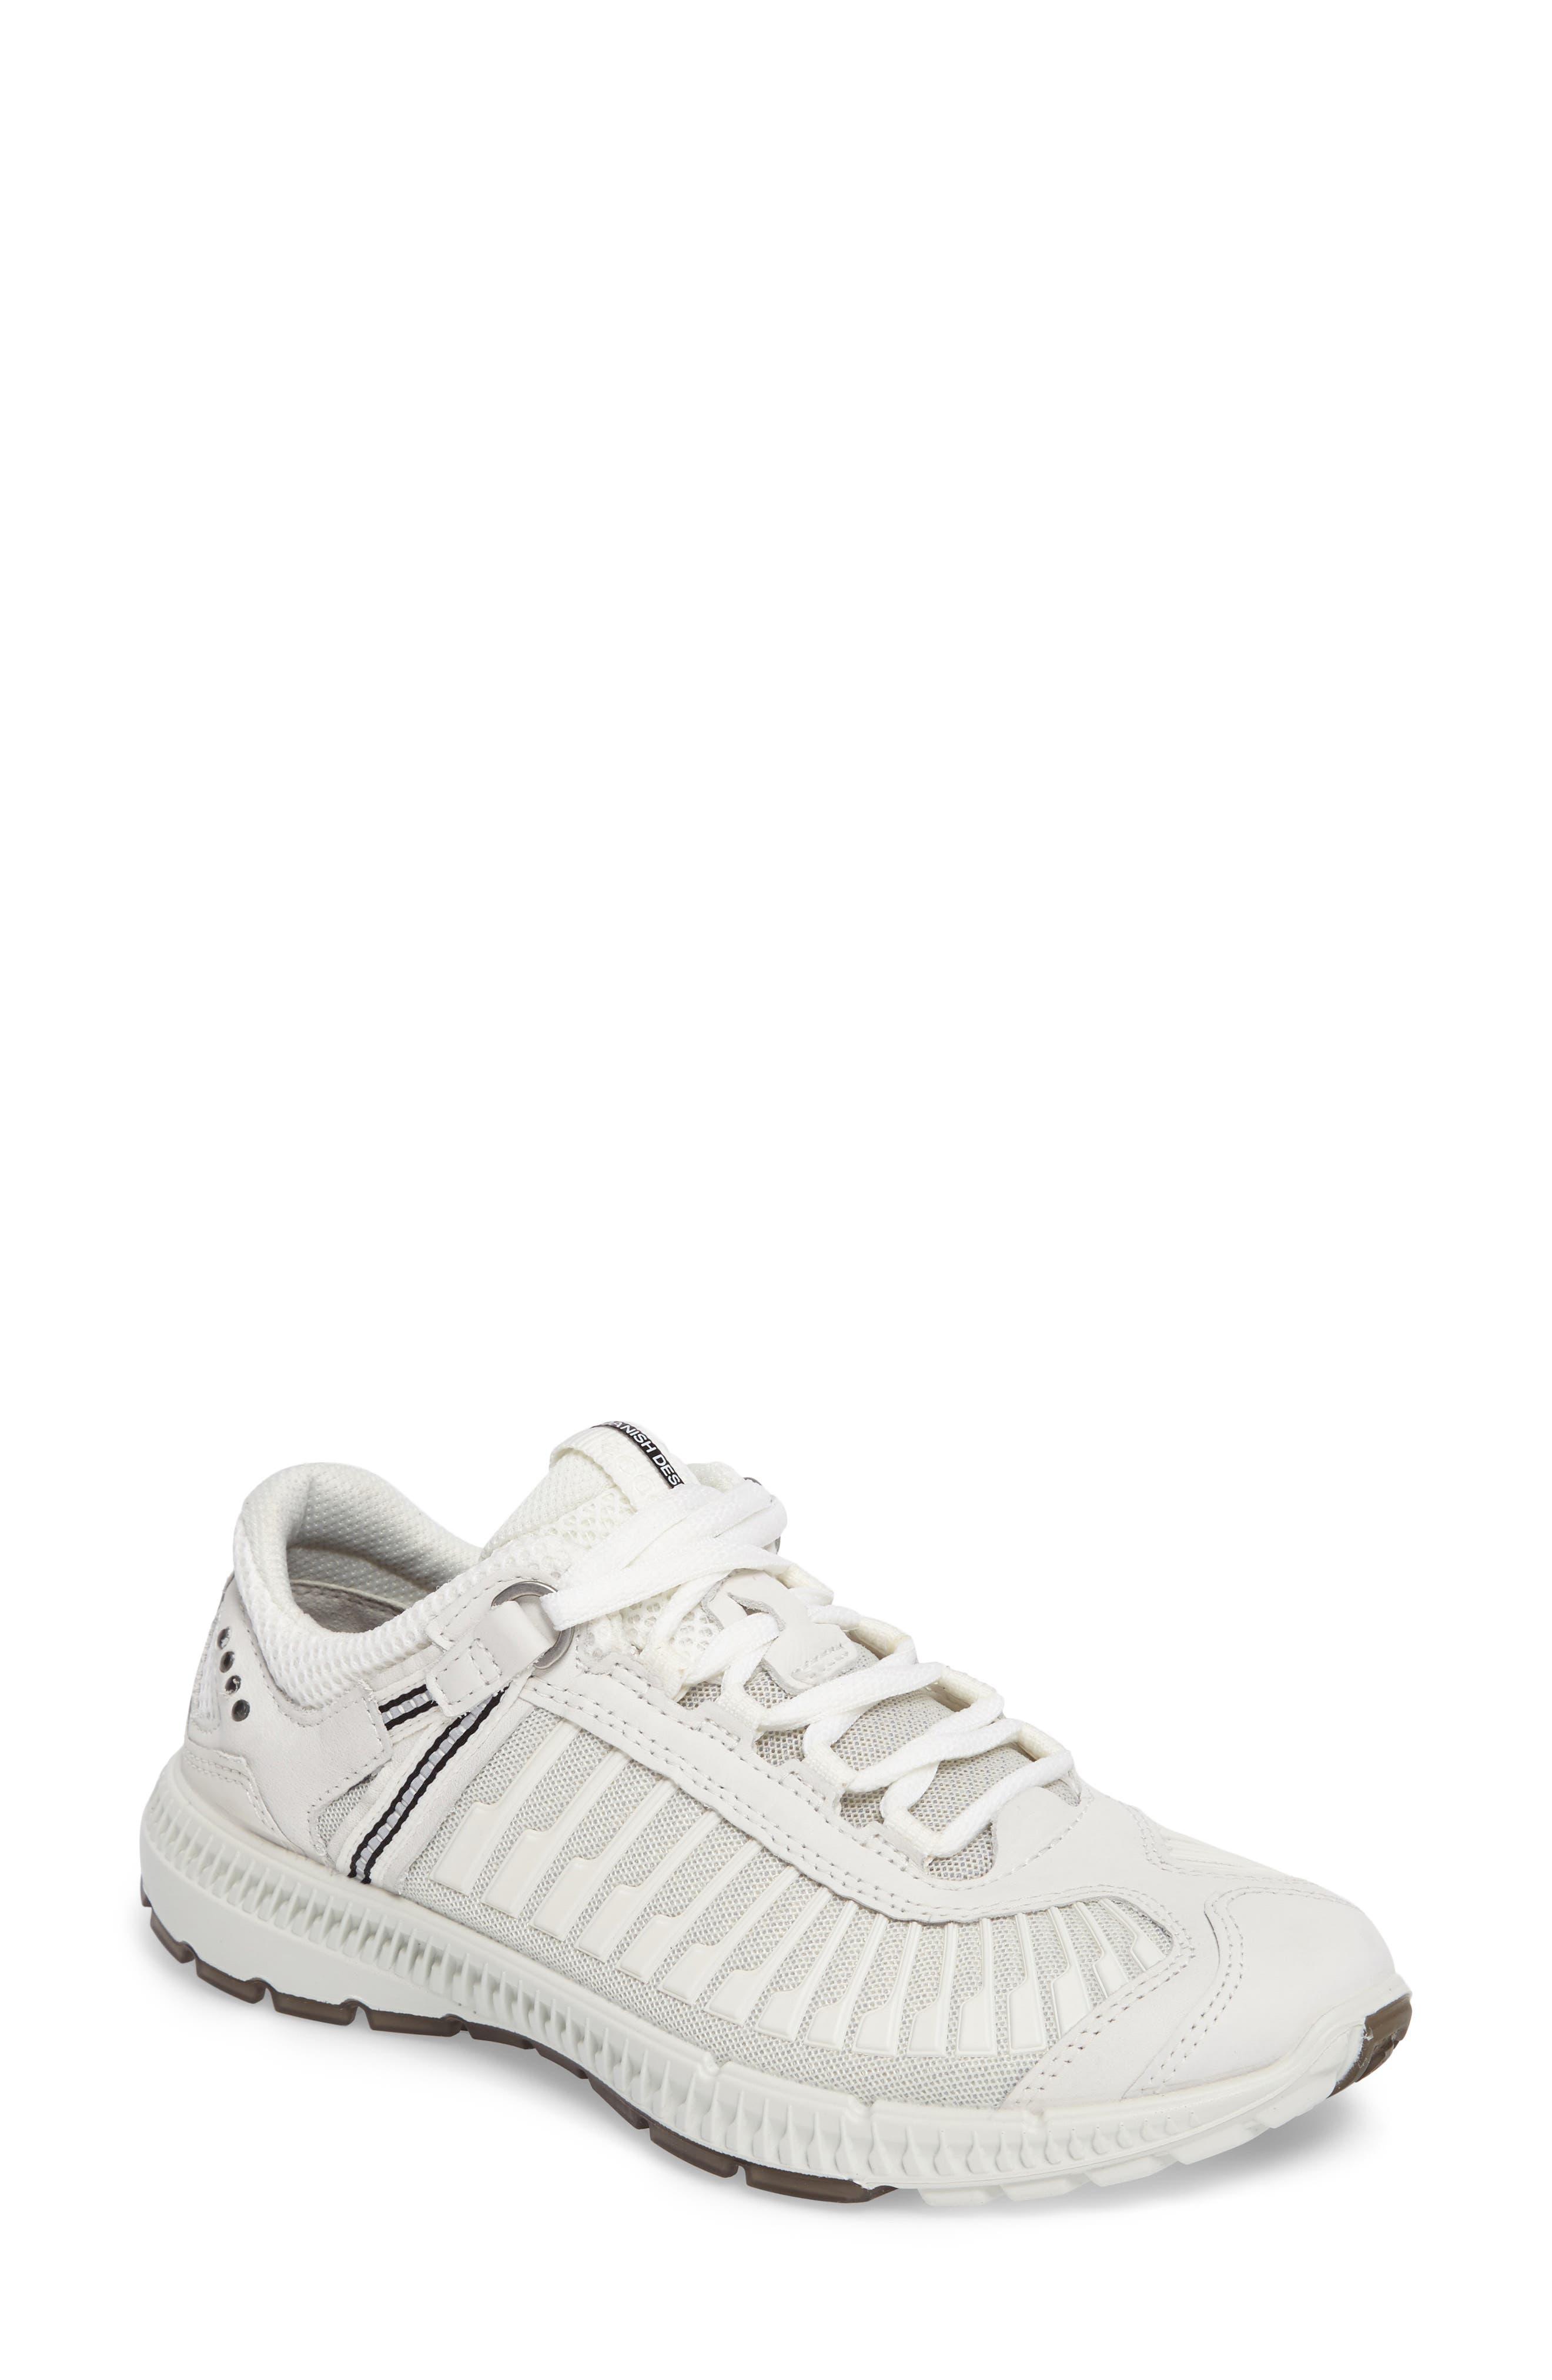 Main Image - ECCO Intrinsic TR Run Sneaker (Women)